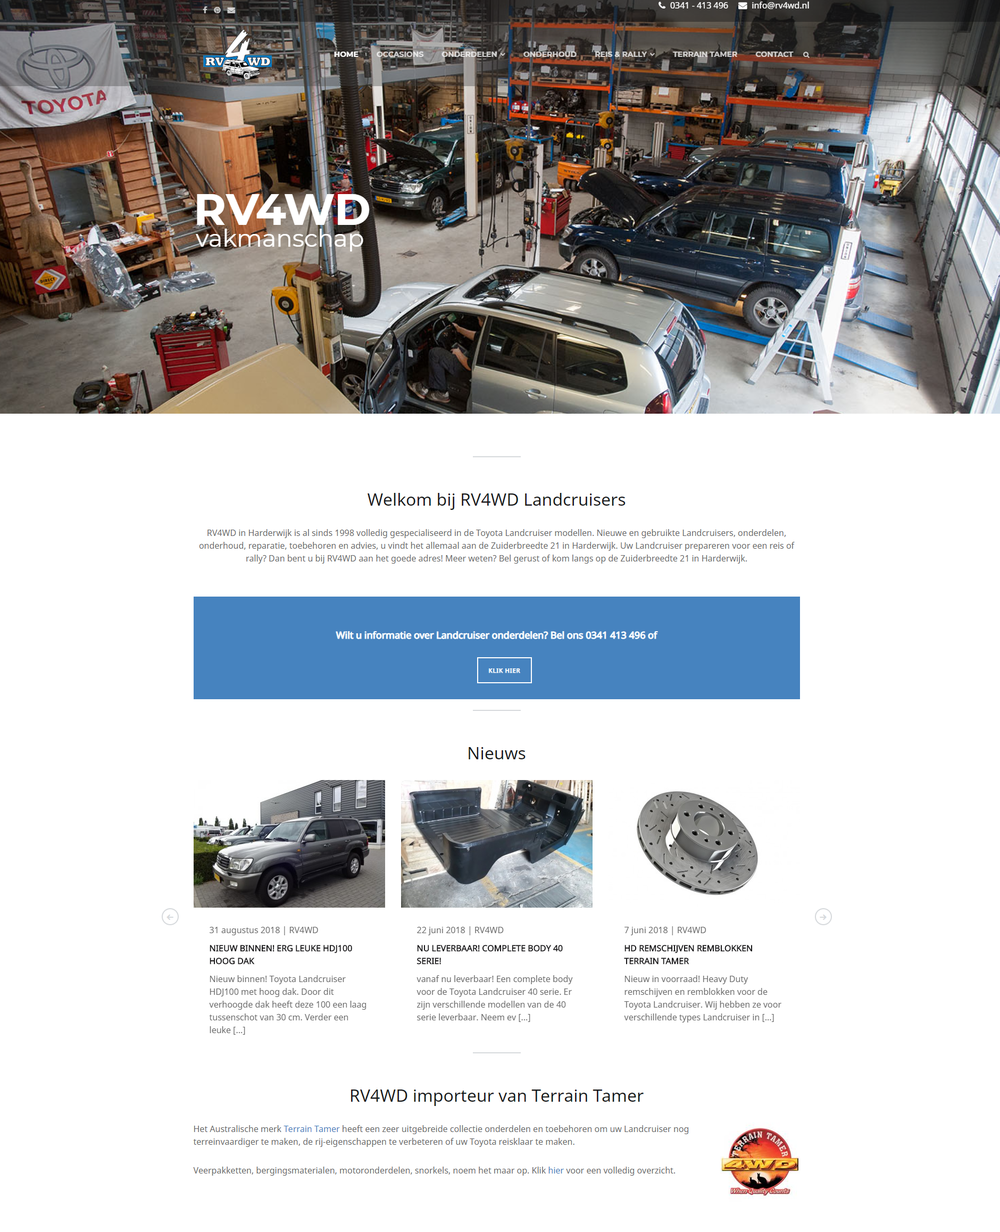 RV4WD Landcruisers